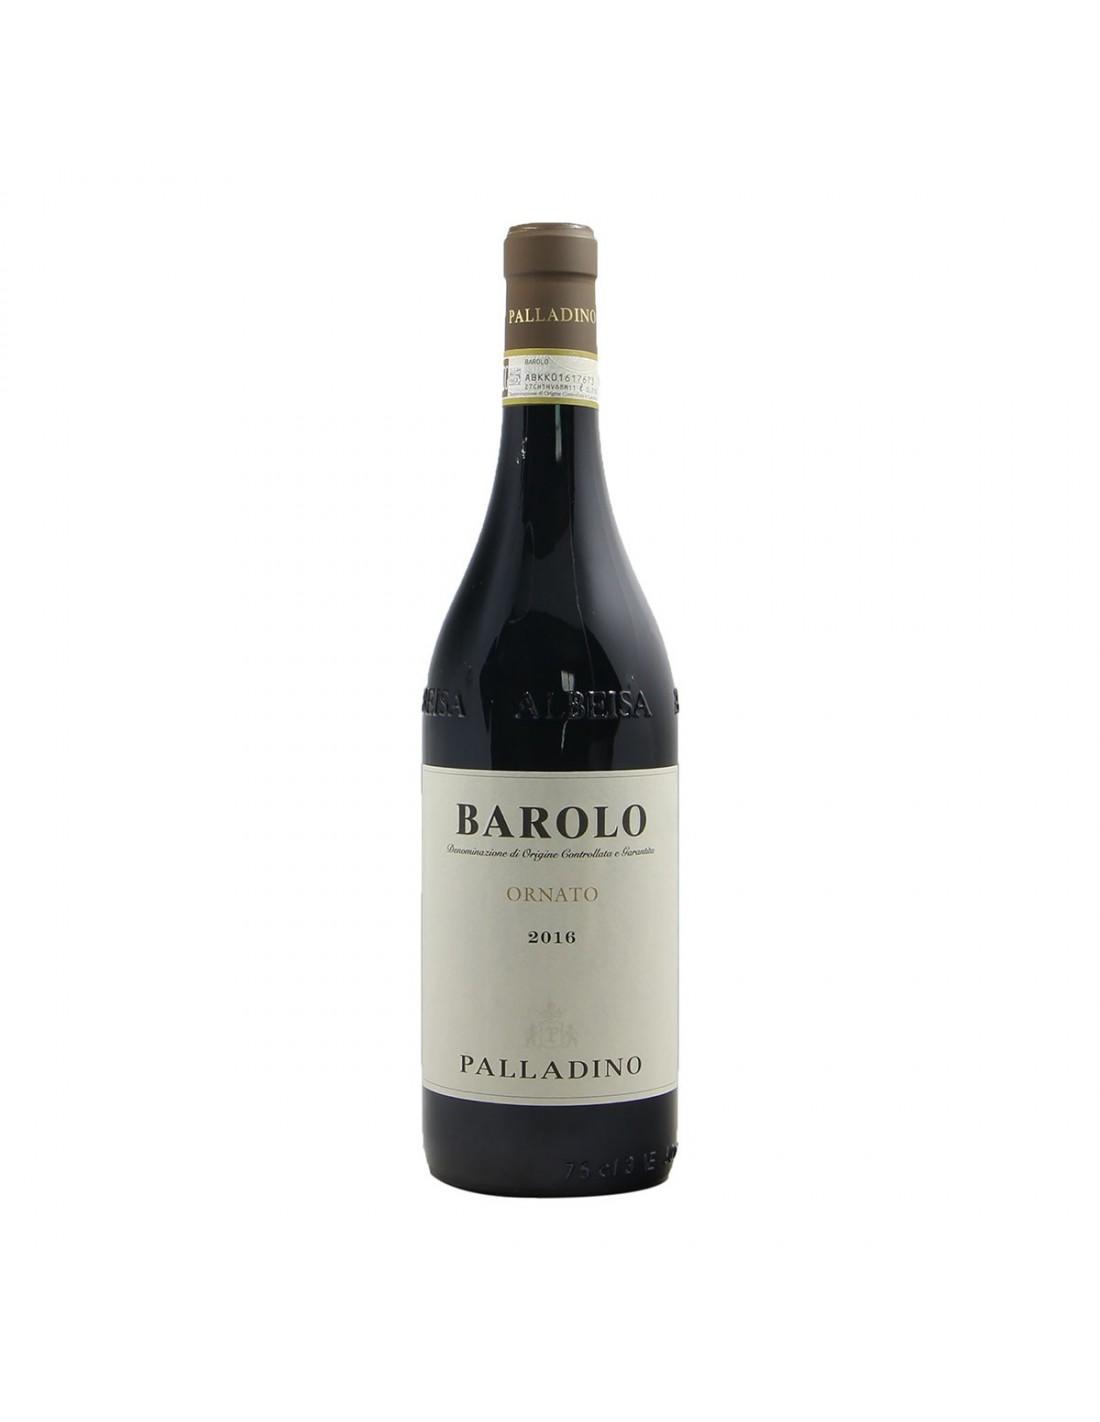 BAROLO ORNATO 2016 PALLADINO Grandi Bottiglie